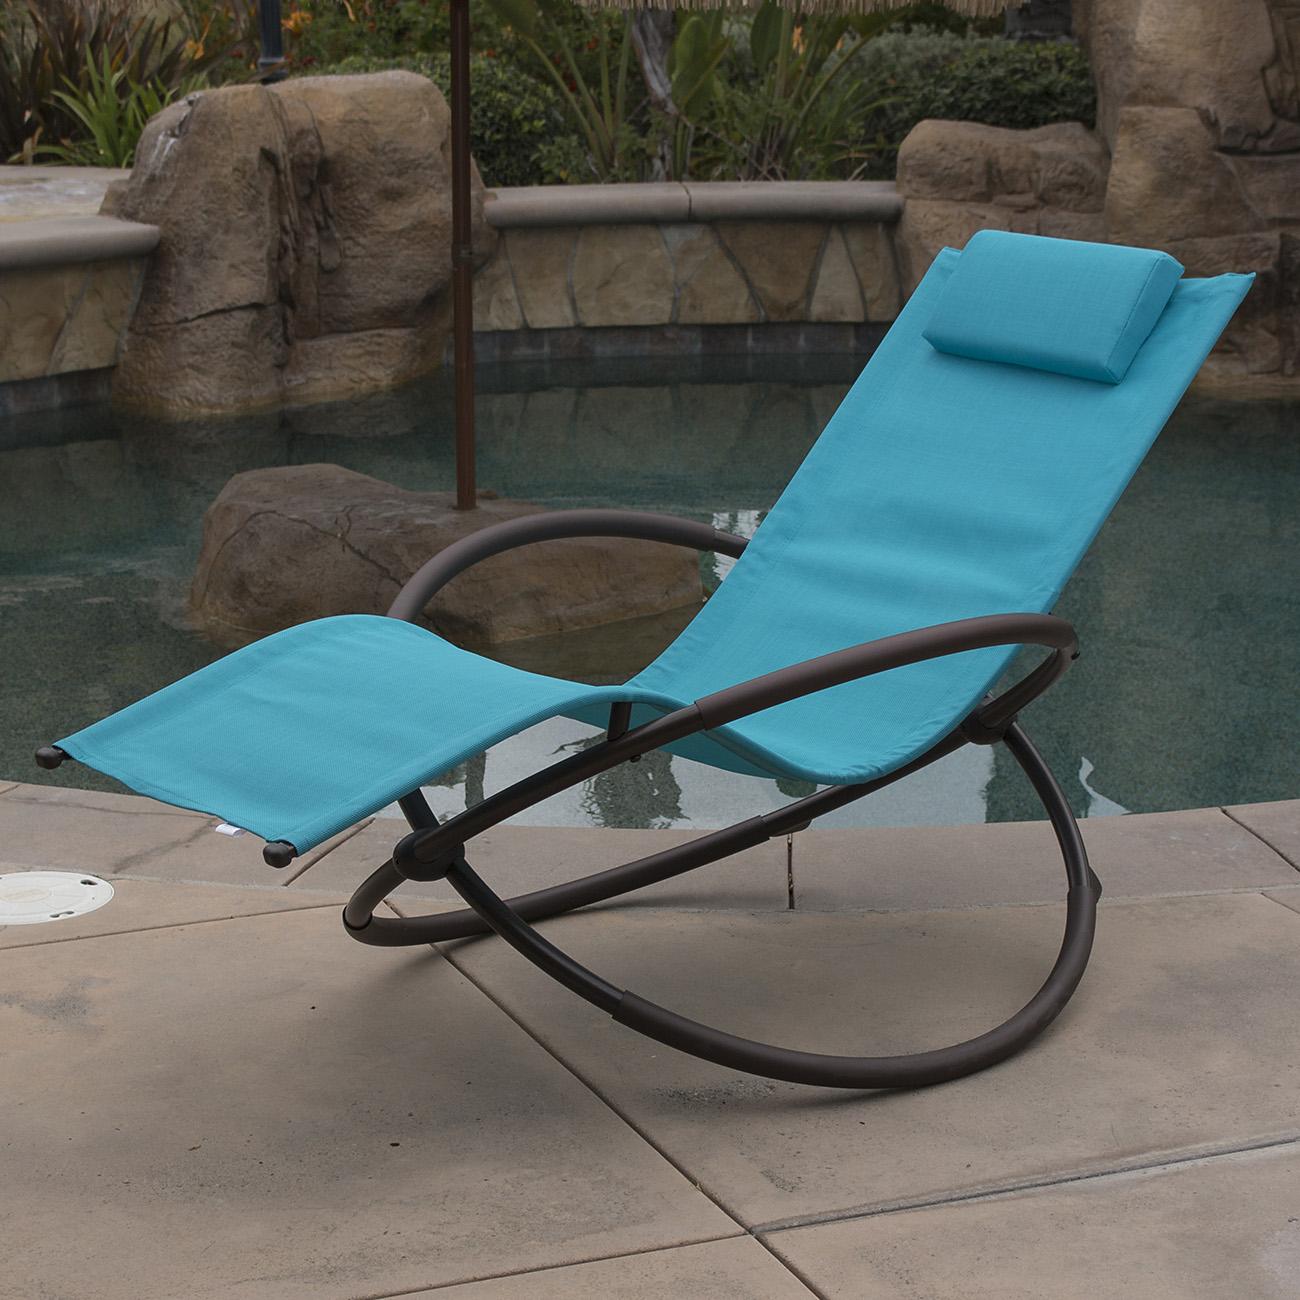 Orbital Folding Zero Gravity Lounge Chairs Outdoor Beach